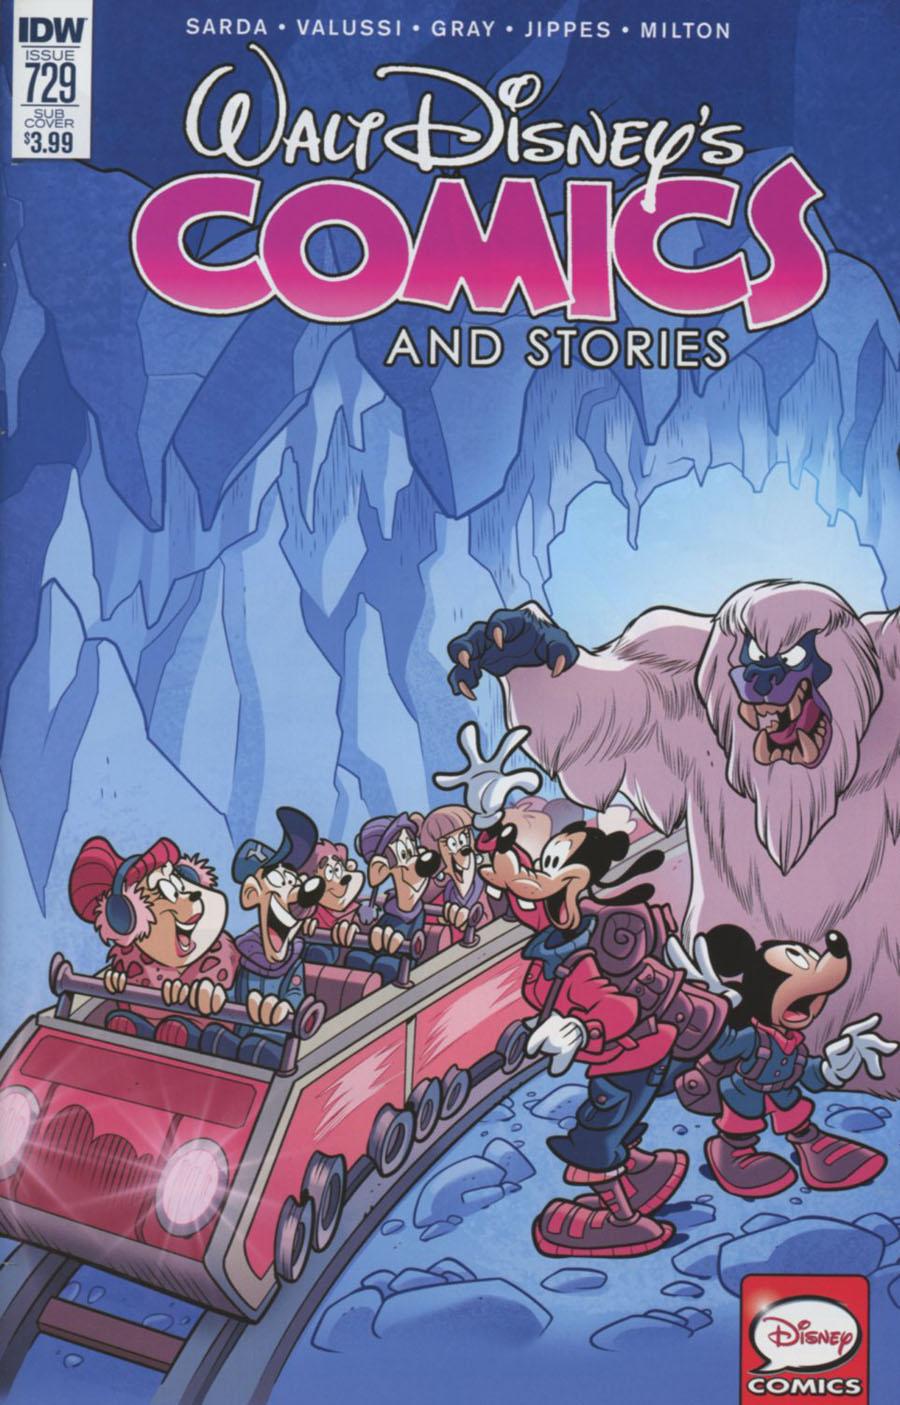 Walt Disneys Comics & Stories #729 Cover B Variant Massimo Asaro Subscription Cover